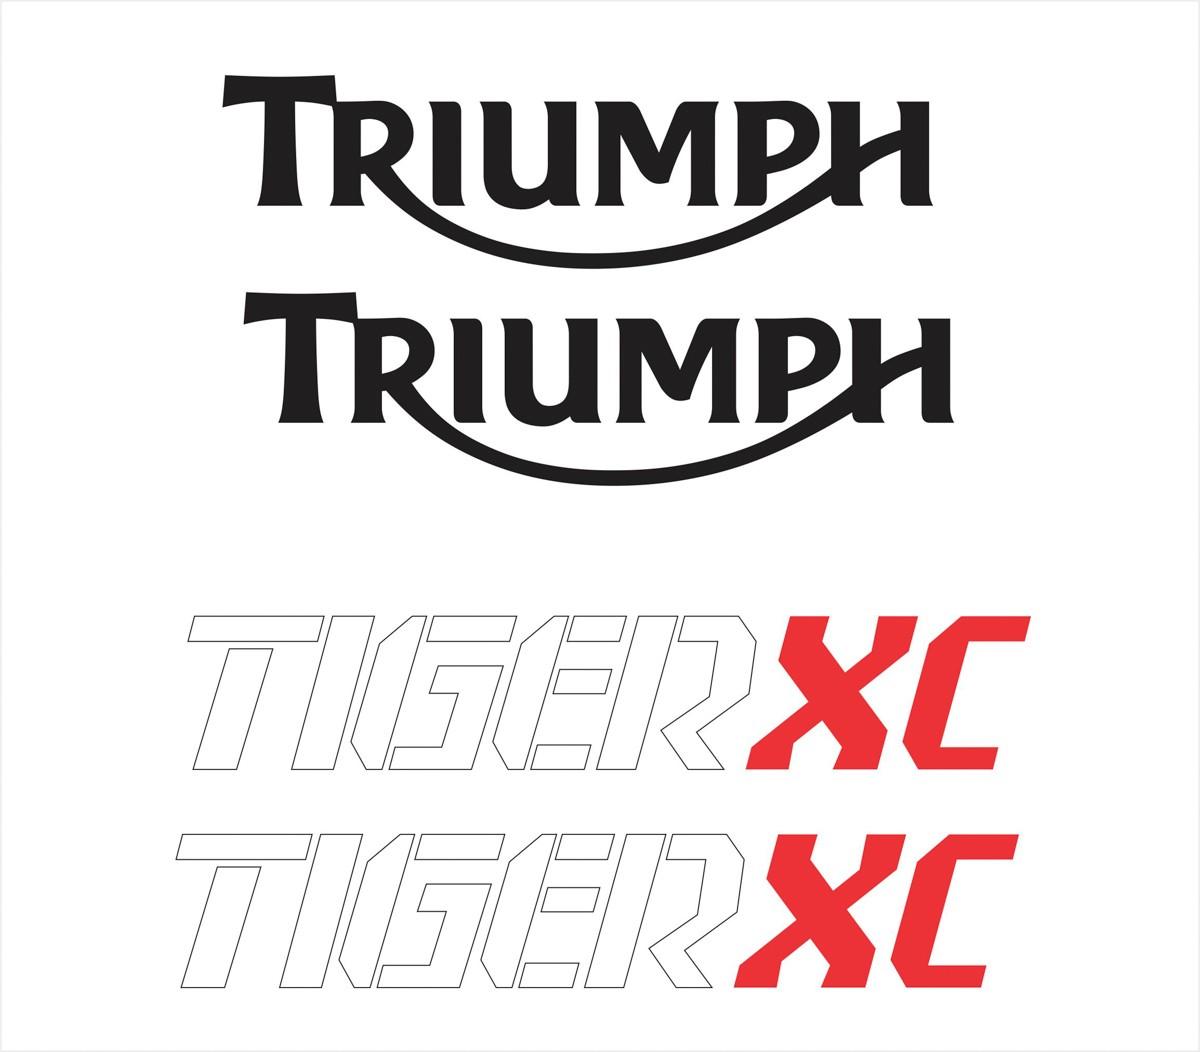 Kit Adesivo Triumph Tiger 800xc 800 Xc 2016 Branca Tg011